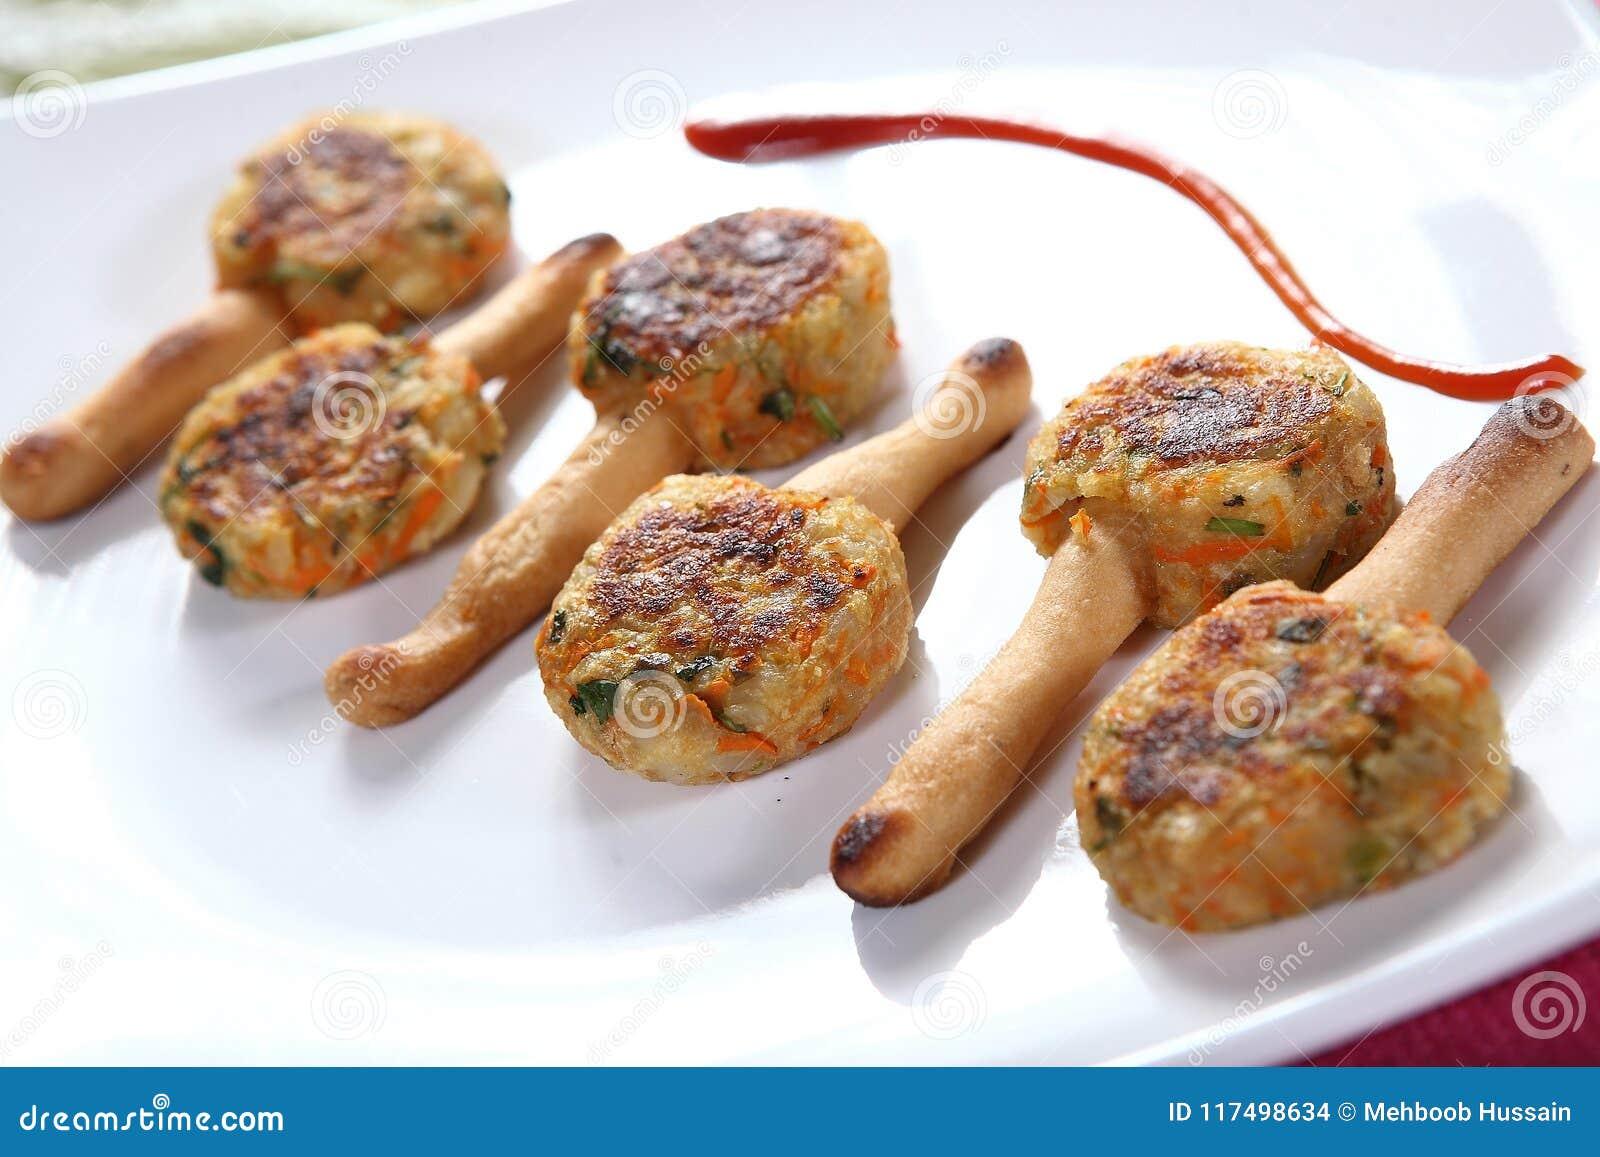 Potato Lollipop Stock Photo Image Of Potatoes Ginger 117498634